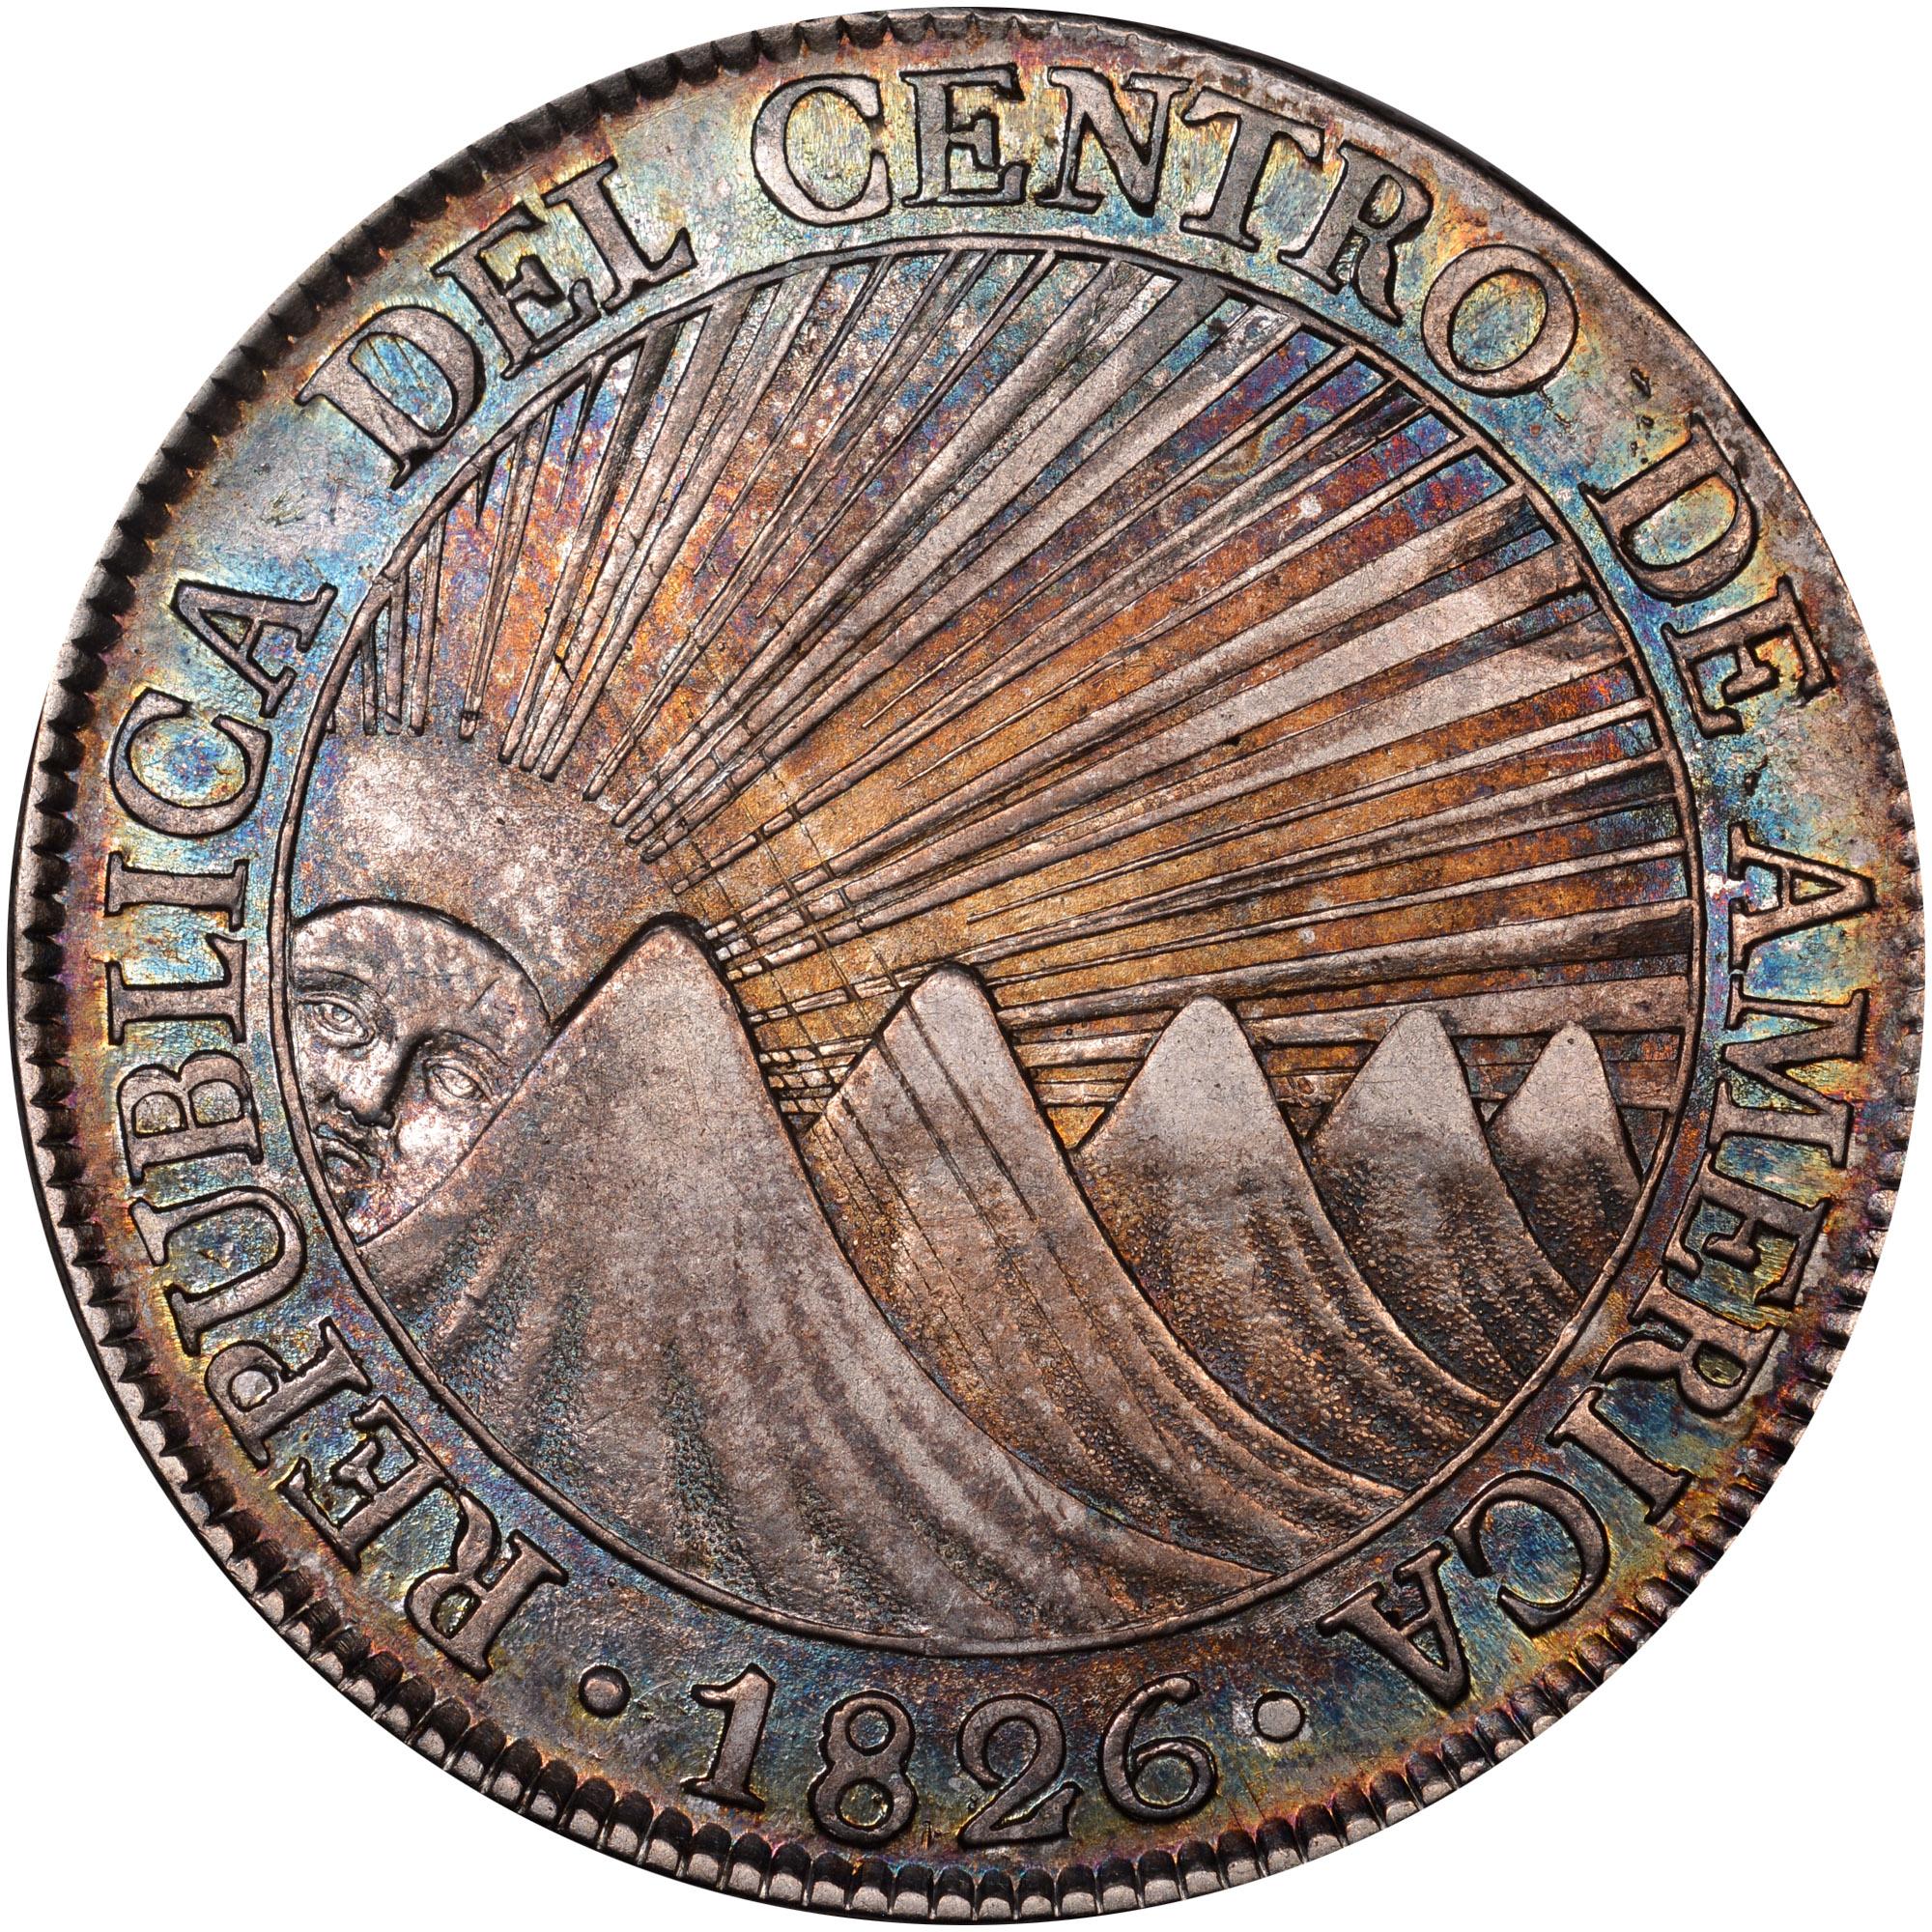 1824-1847/6 Central American Republic 8 Reales obverse